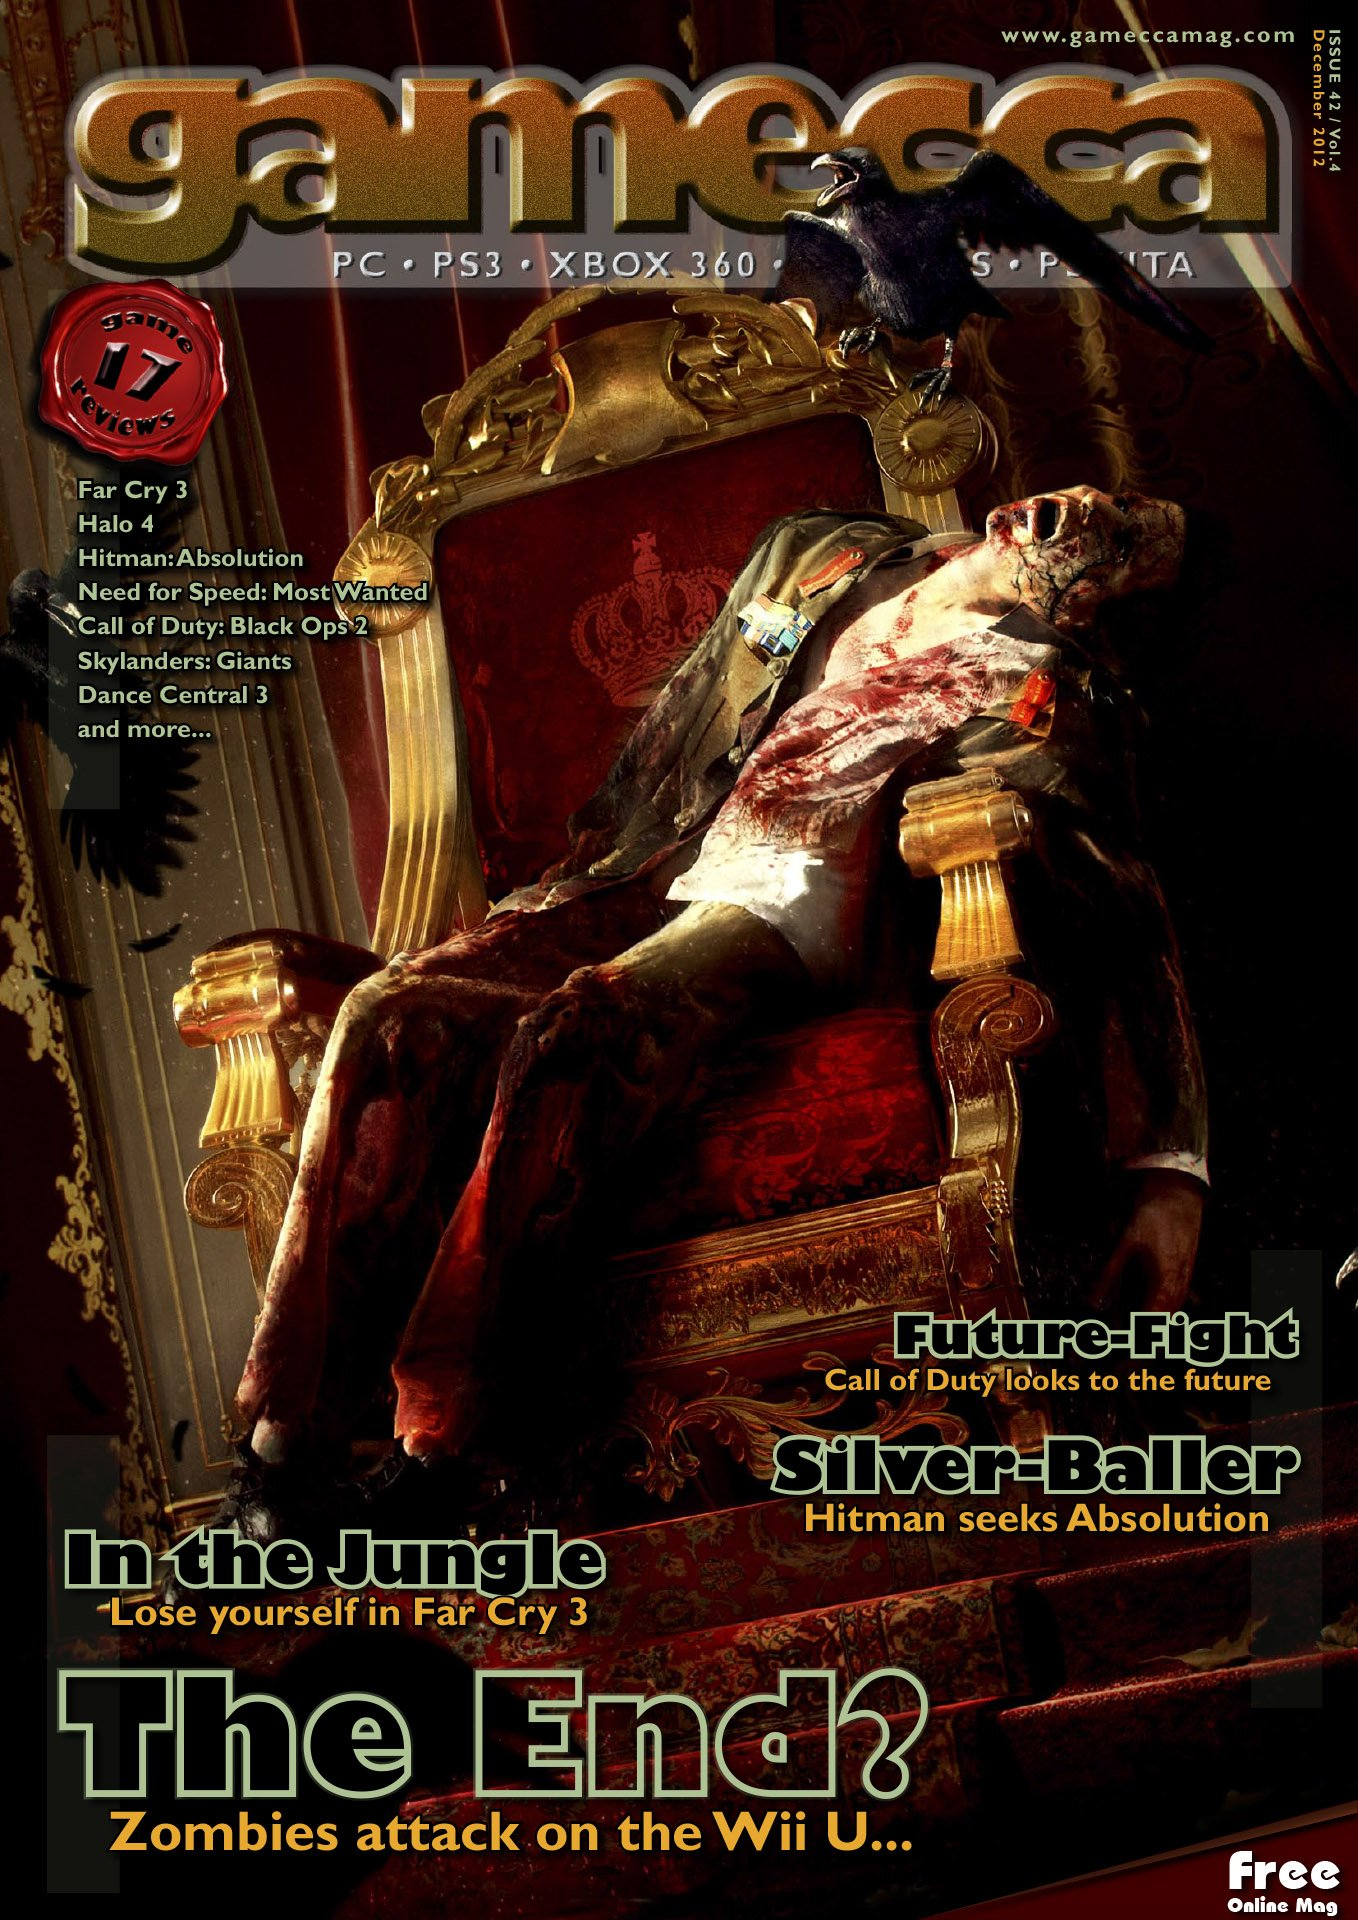 Gamecca 042 (December 2012)